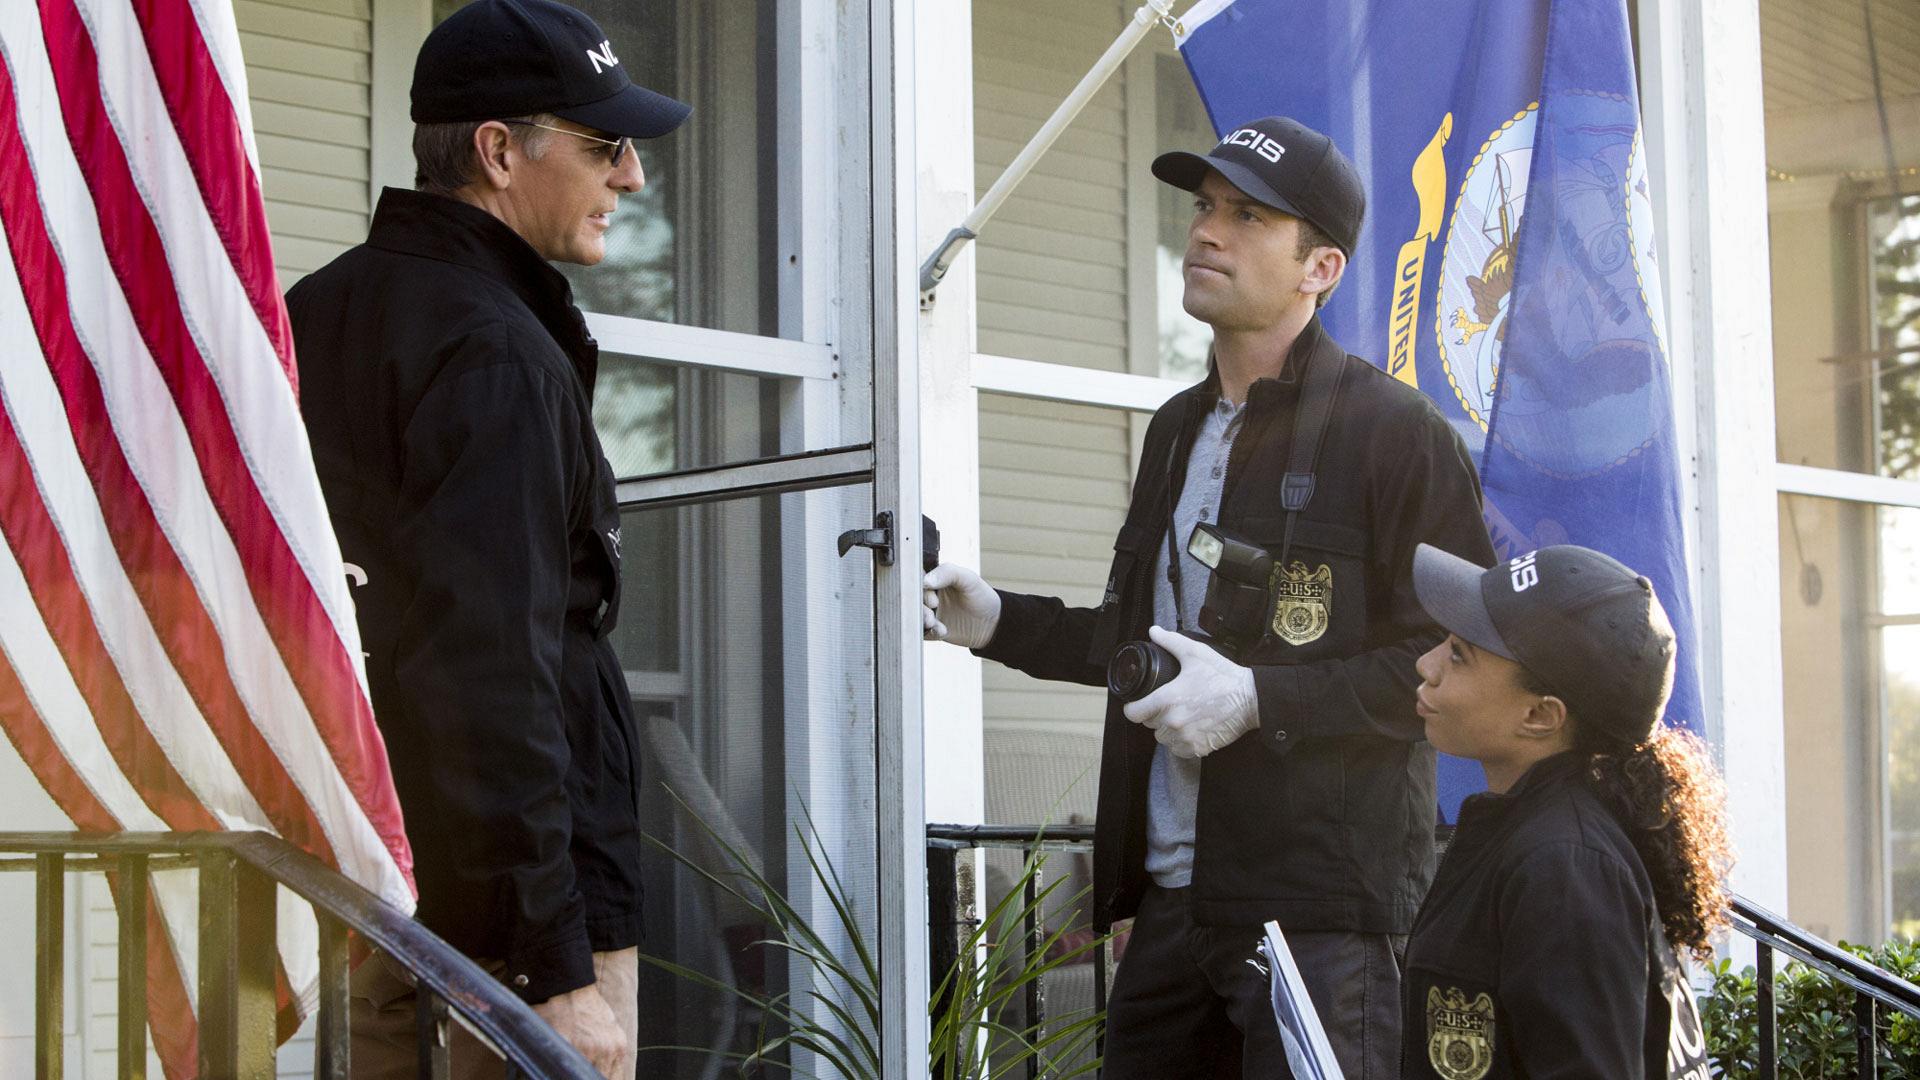 Scott Bakula as Dwayne Pride, Lucas Black as Christopher LaSalle, and Shalita Grant as Sonja Percy